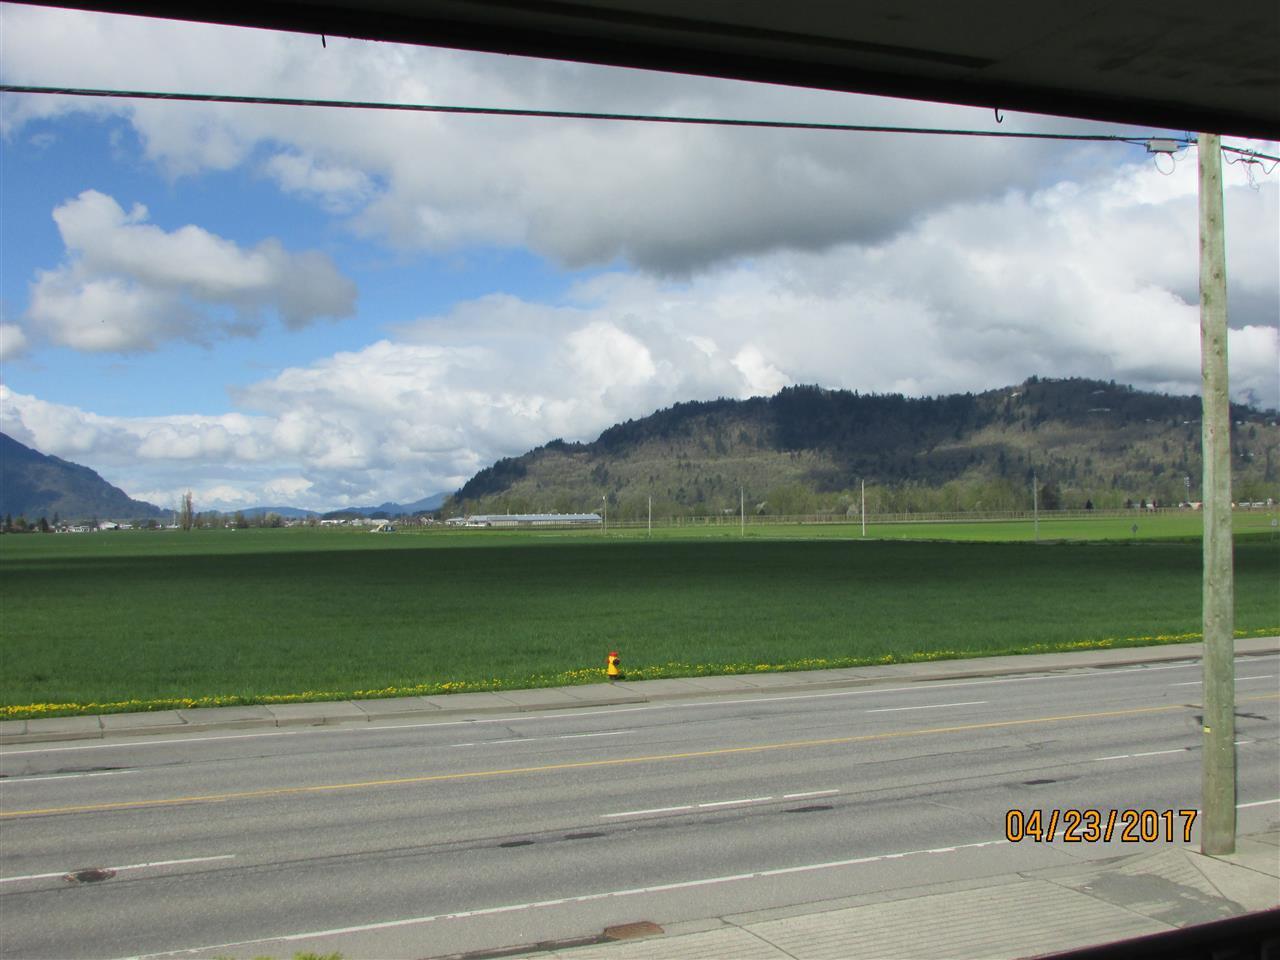 Photo 6: Photos: 7220 EVANS Road in Sardis: Sardis West Vedder Rd House for sale : MLS®# R2160379